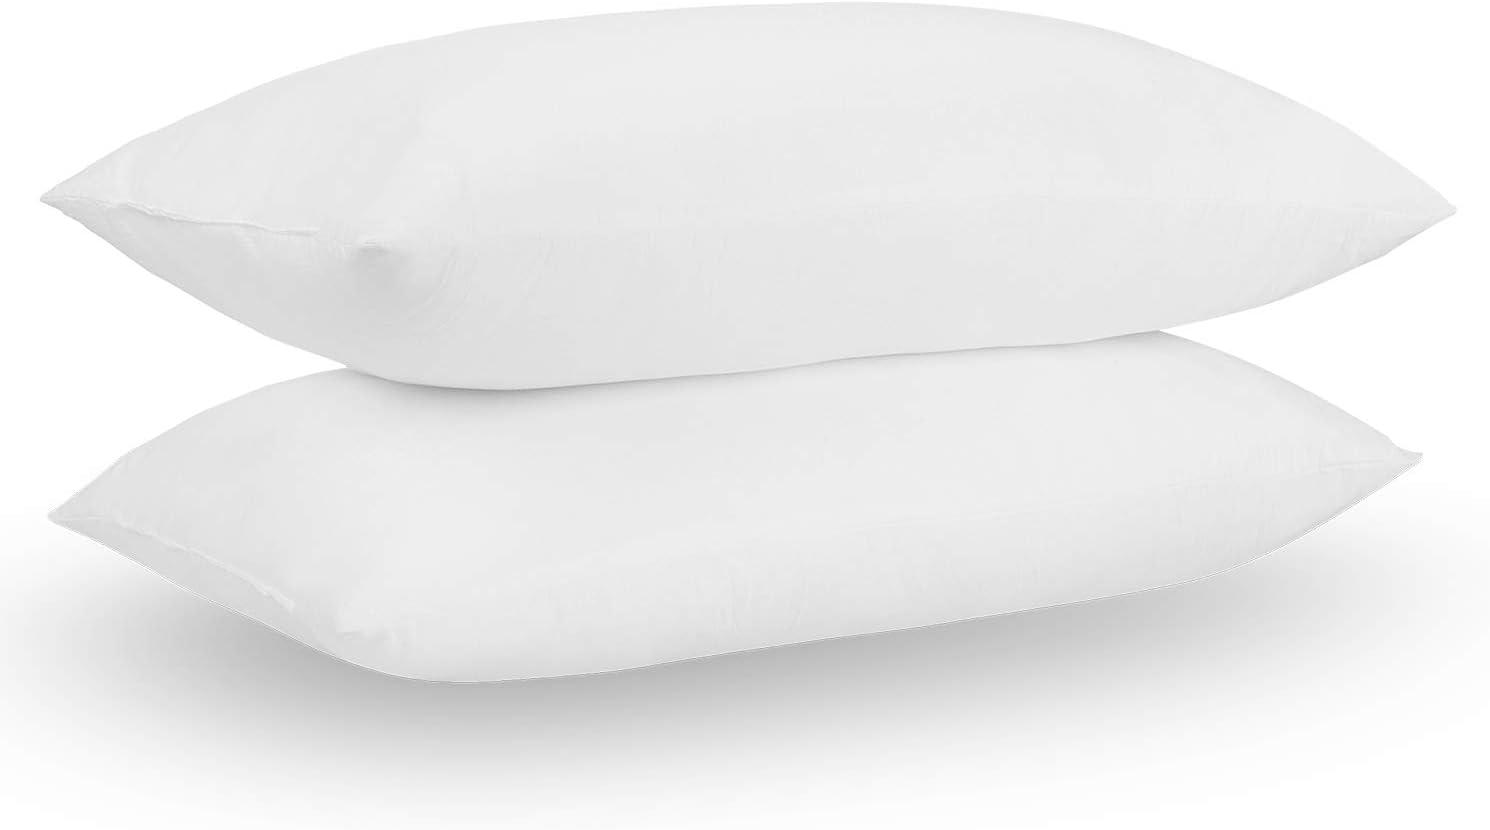 "Acanva Basic Bed Pillow Soft Rest Cushion Stuffer for Sleeping, Standard 20"" x 26""-2P, White 2 Pack"